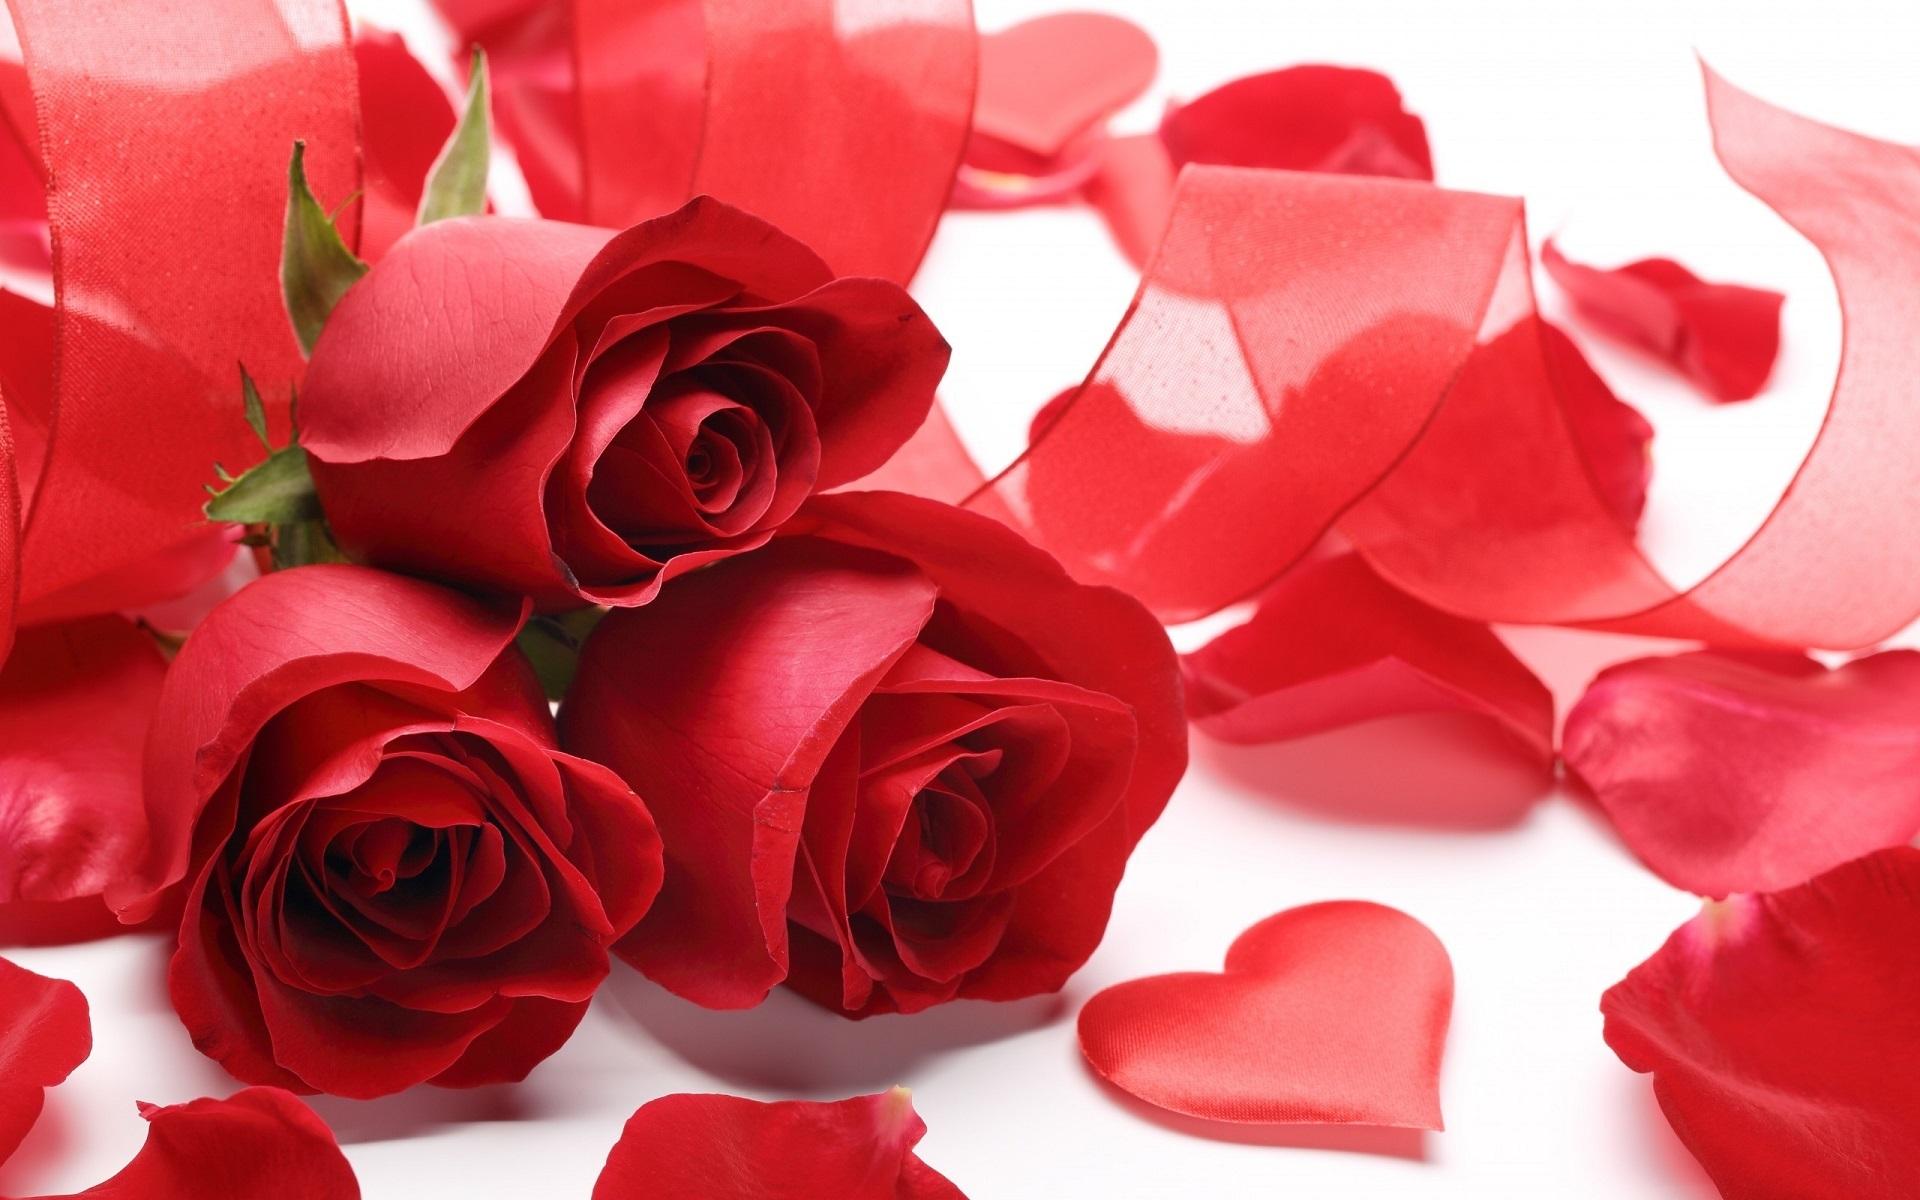 Gambar Mawar Jantung Cinta Simbol Percintaan Valentine